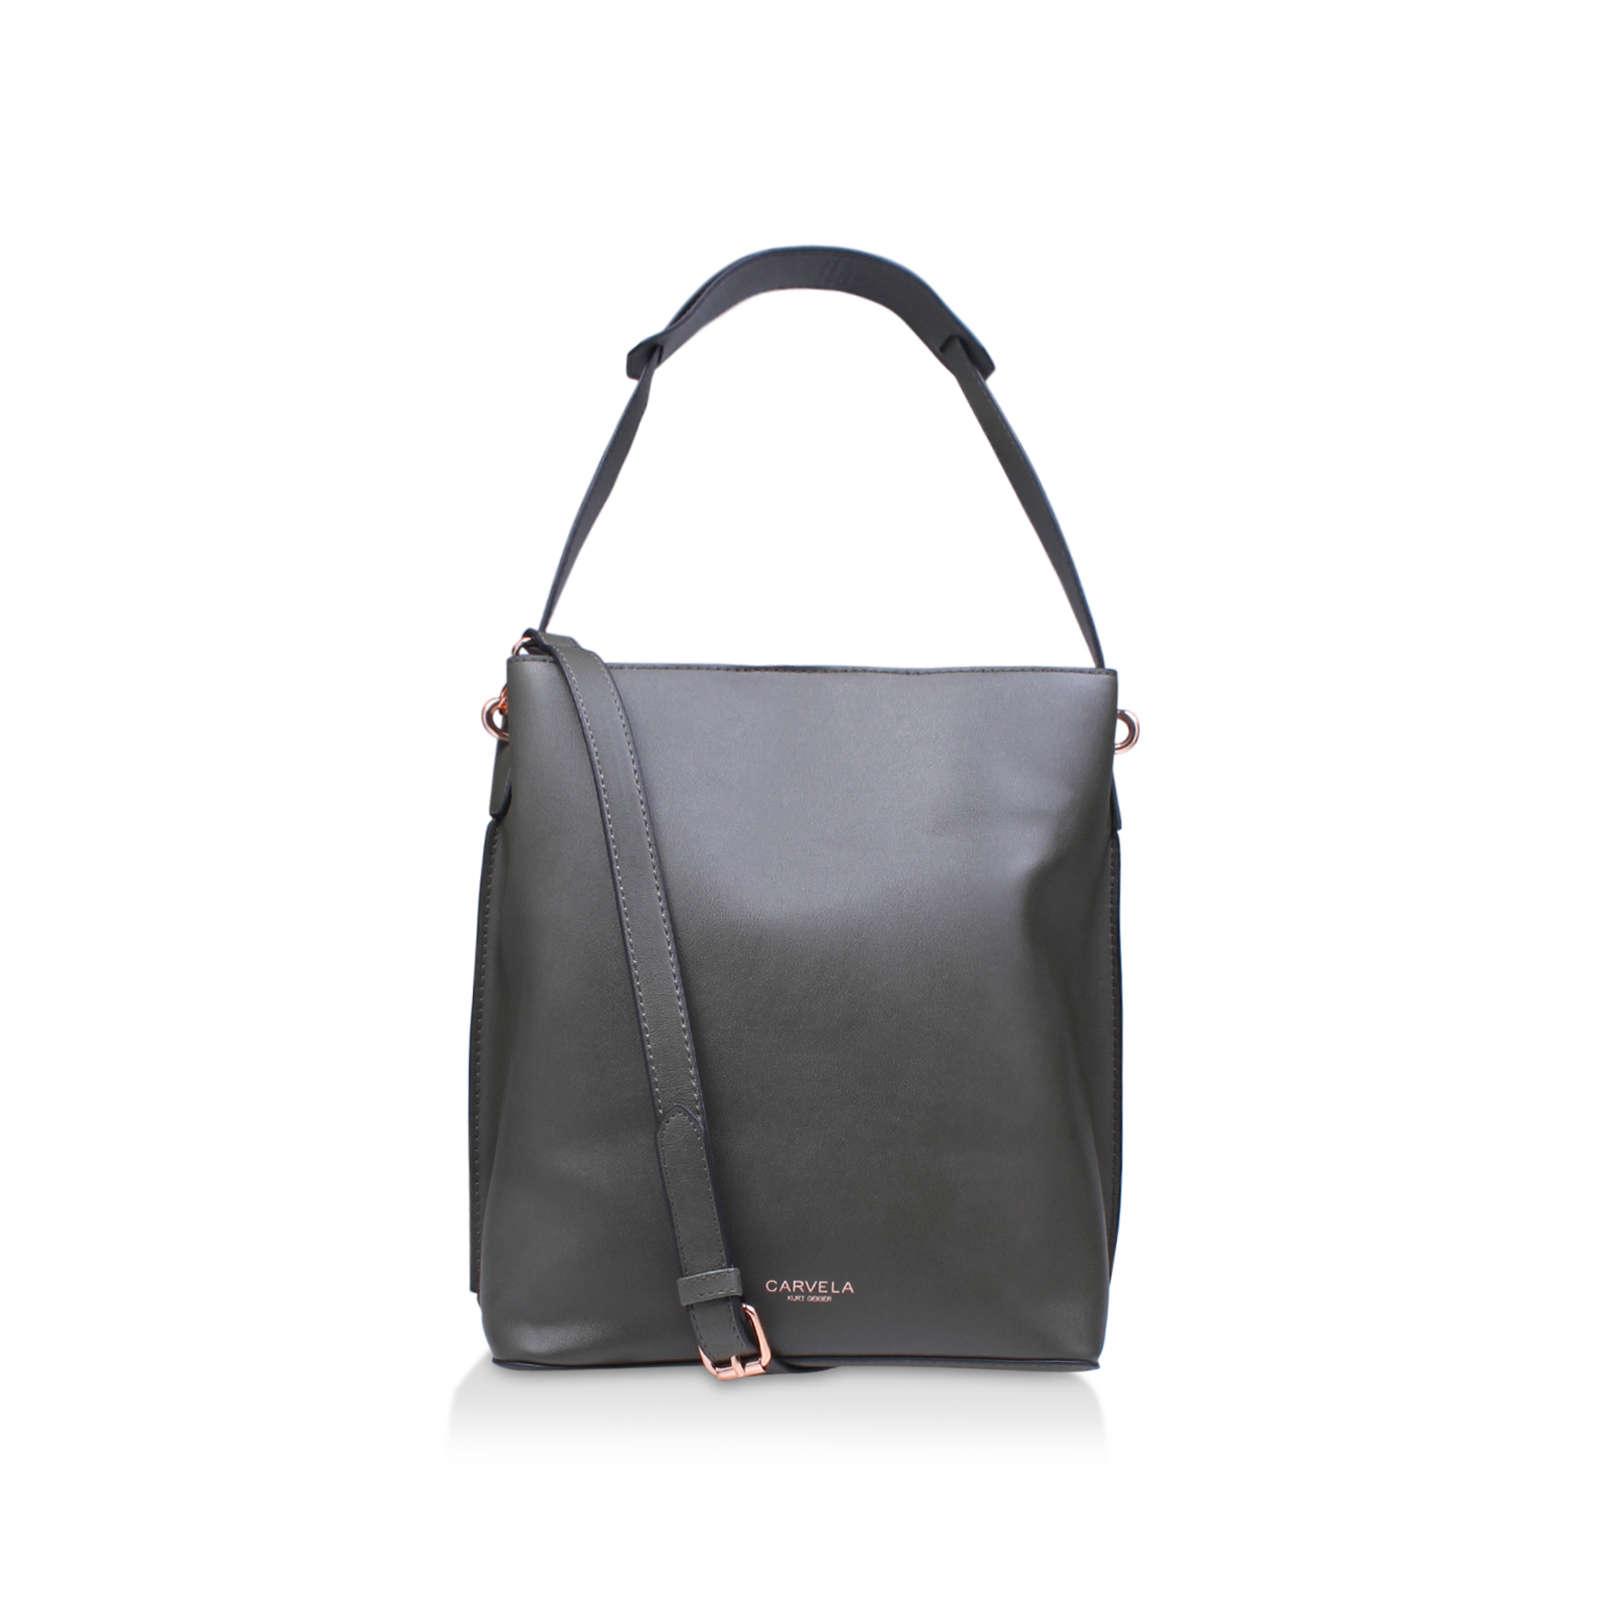 RITA BUCKET BAG